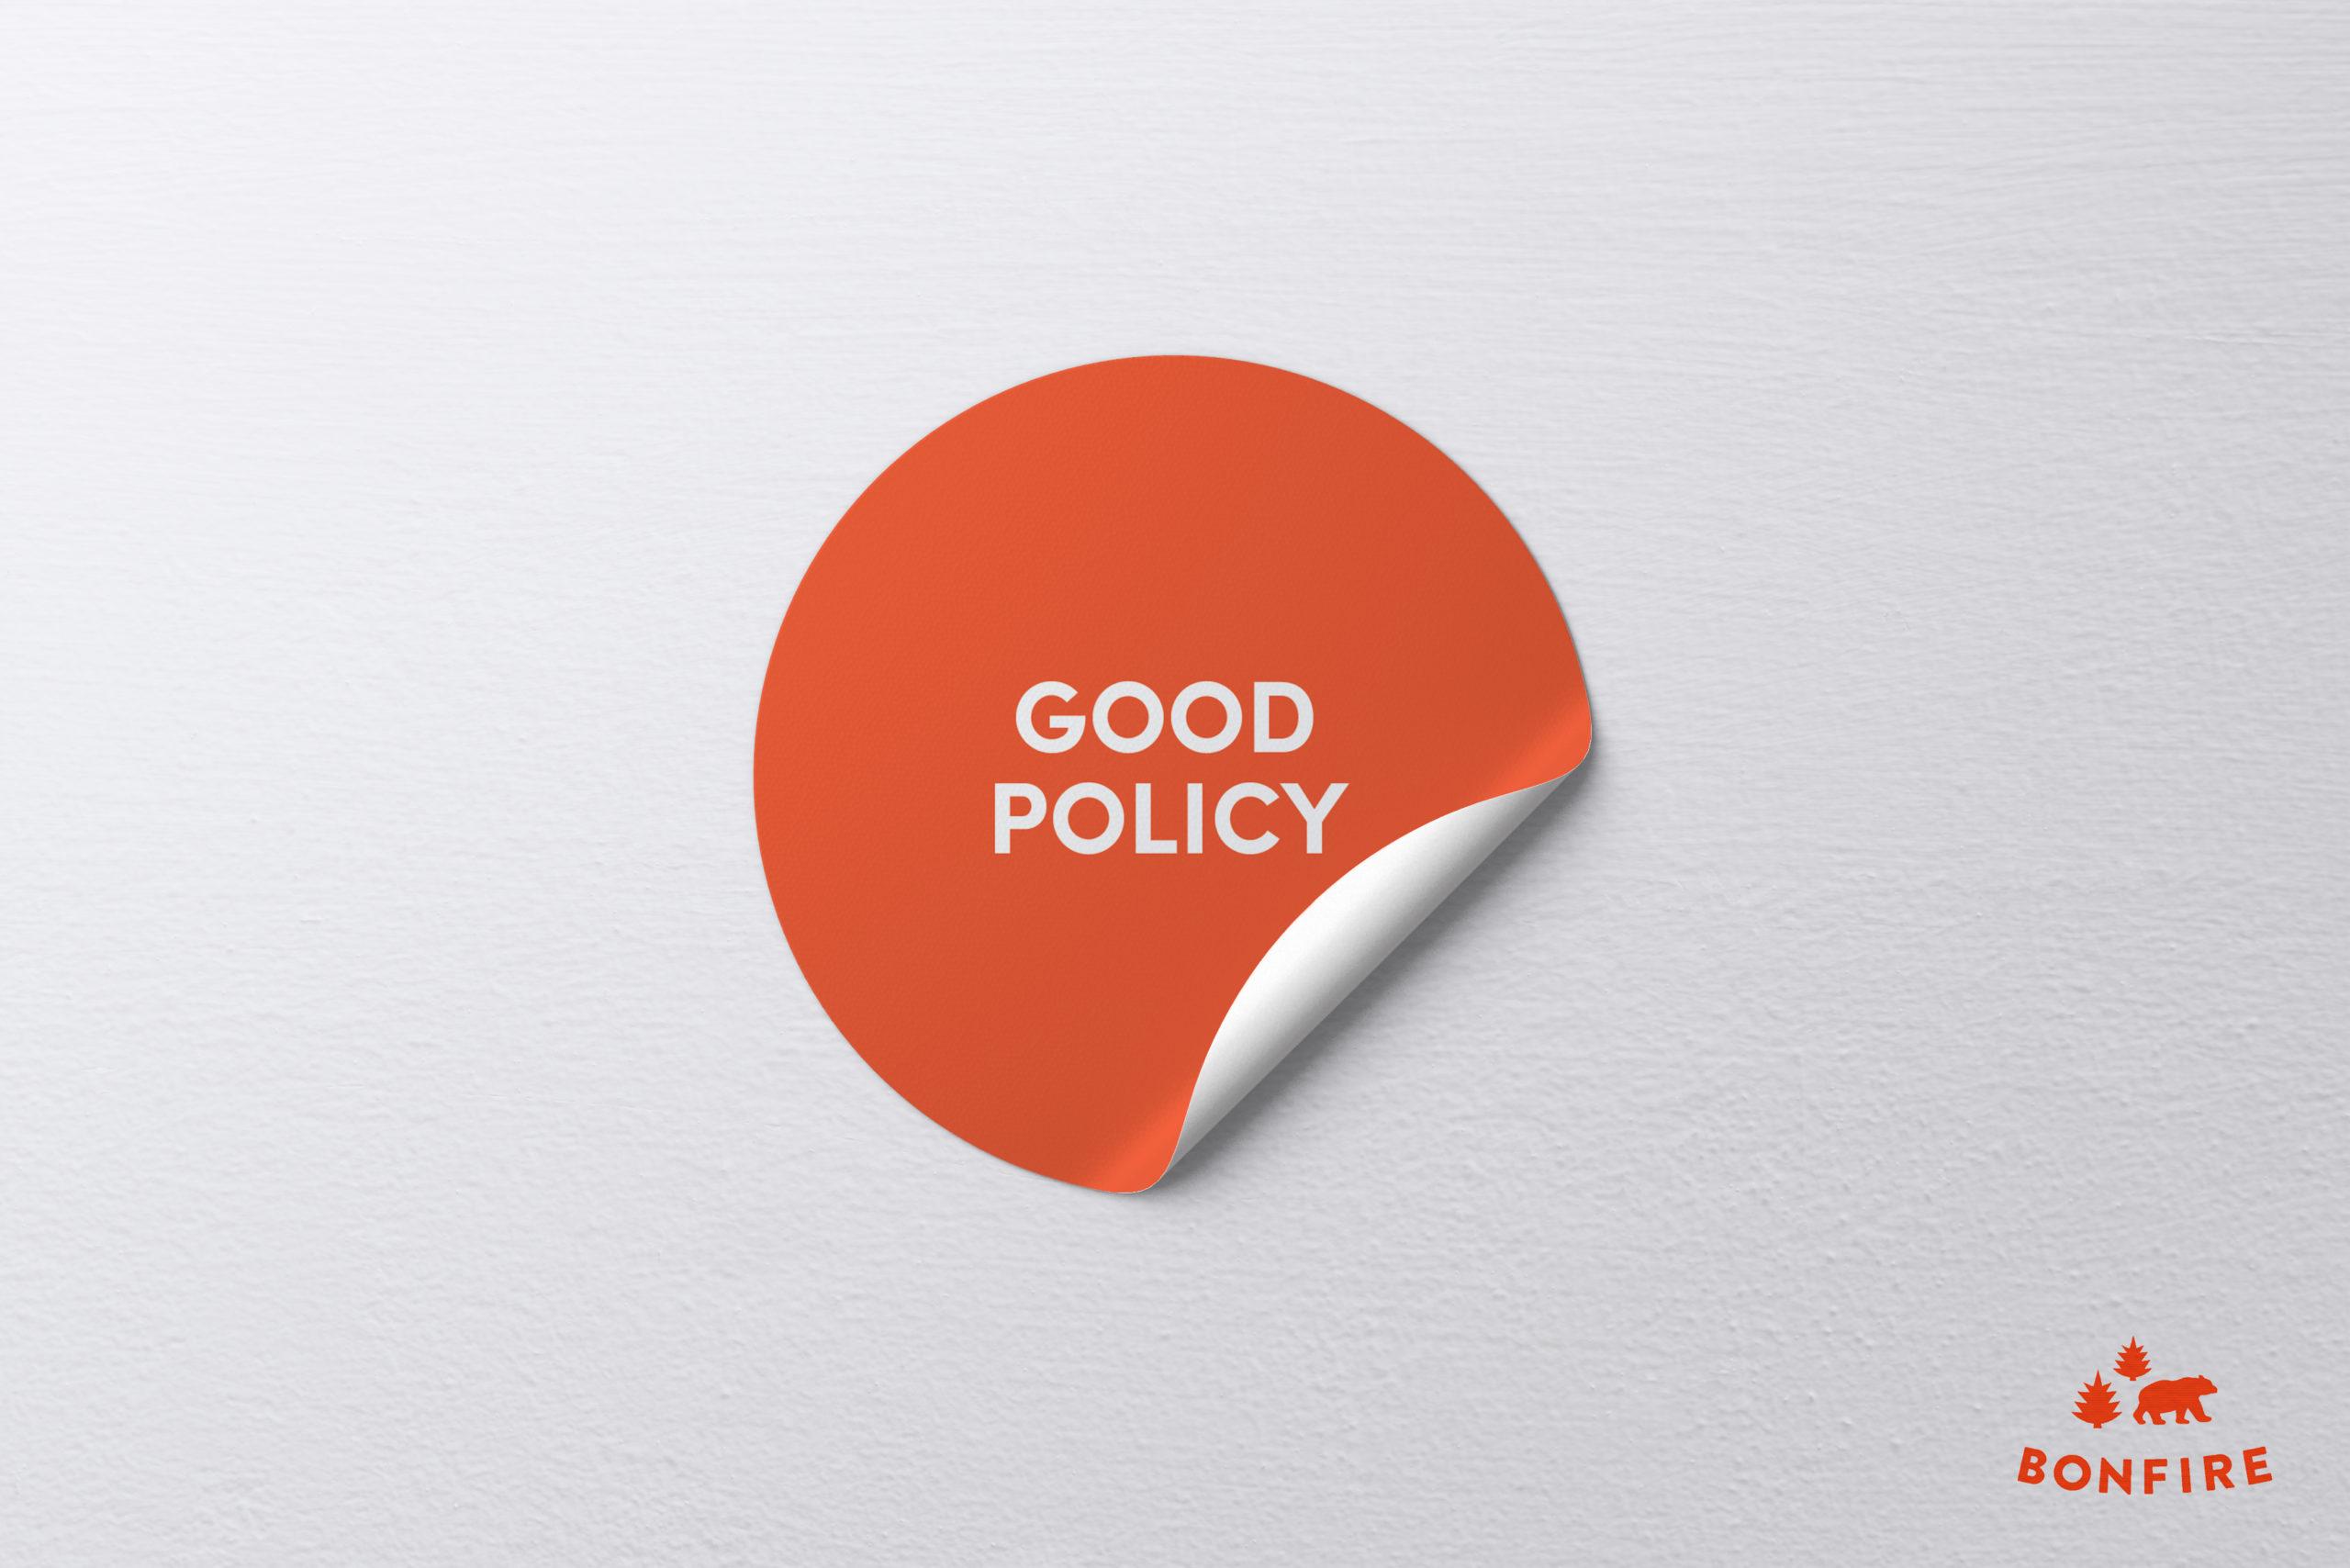 Good Policy sticker